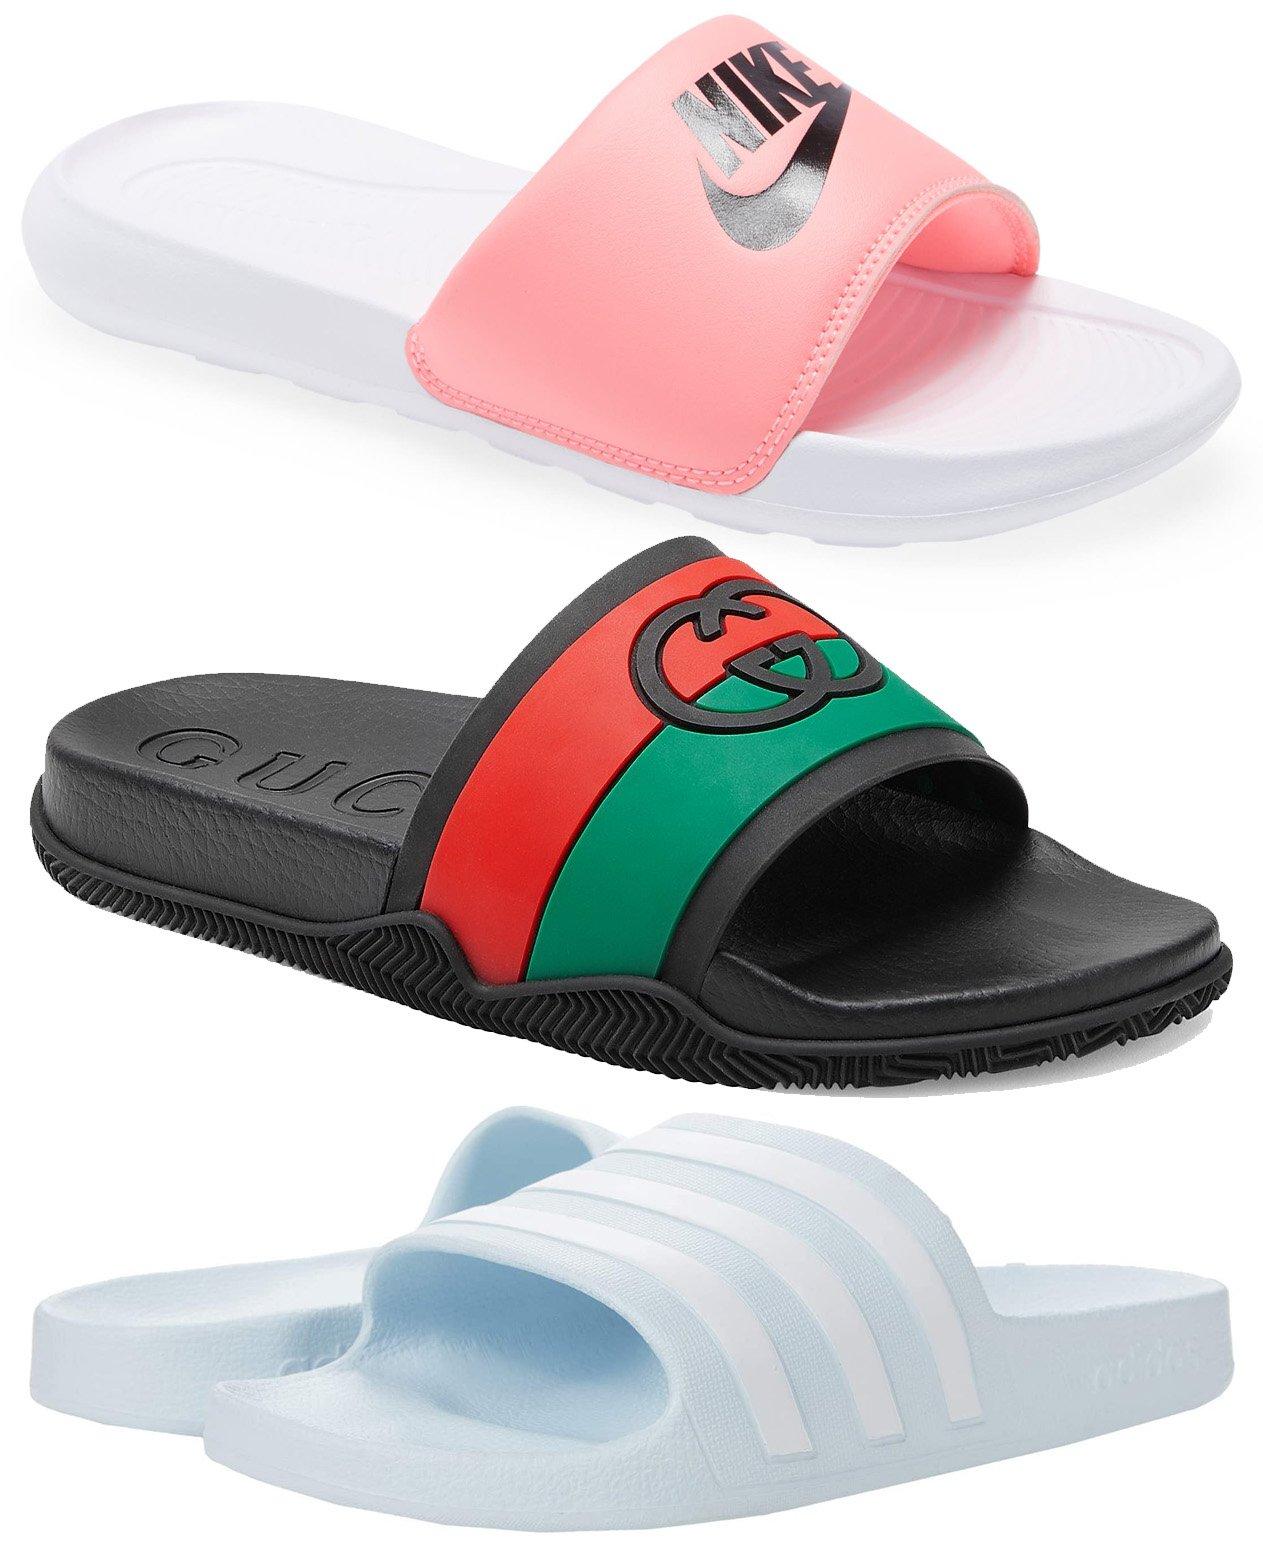 Nike Victori Slide Sandal, Gucci Agrado Interlocking G Slide Sandal, Adidas Adilette Aqua Slides